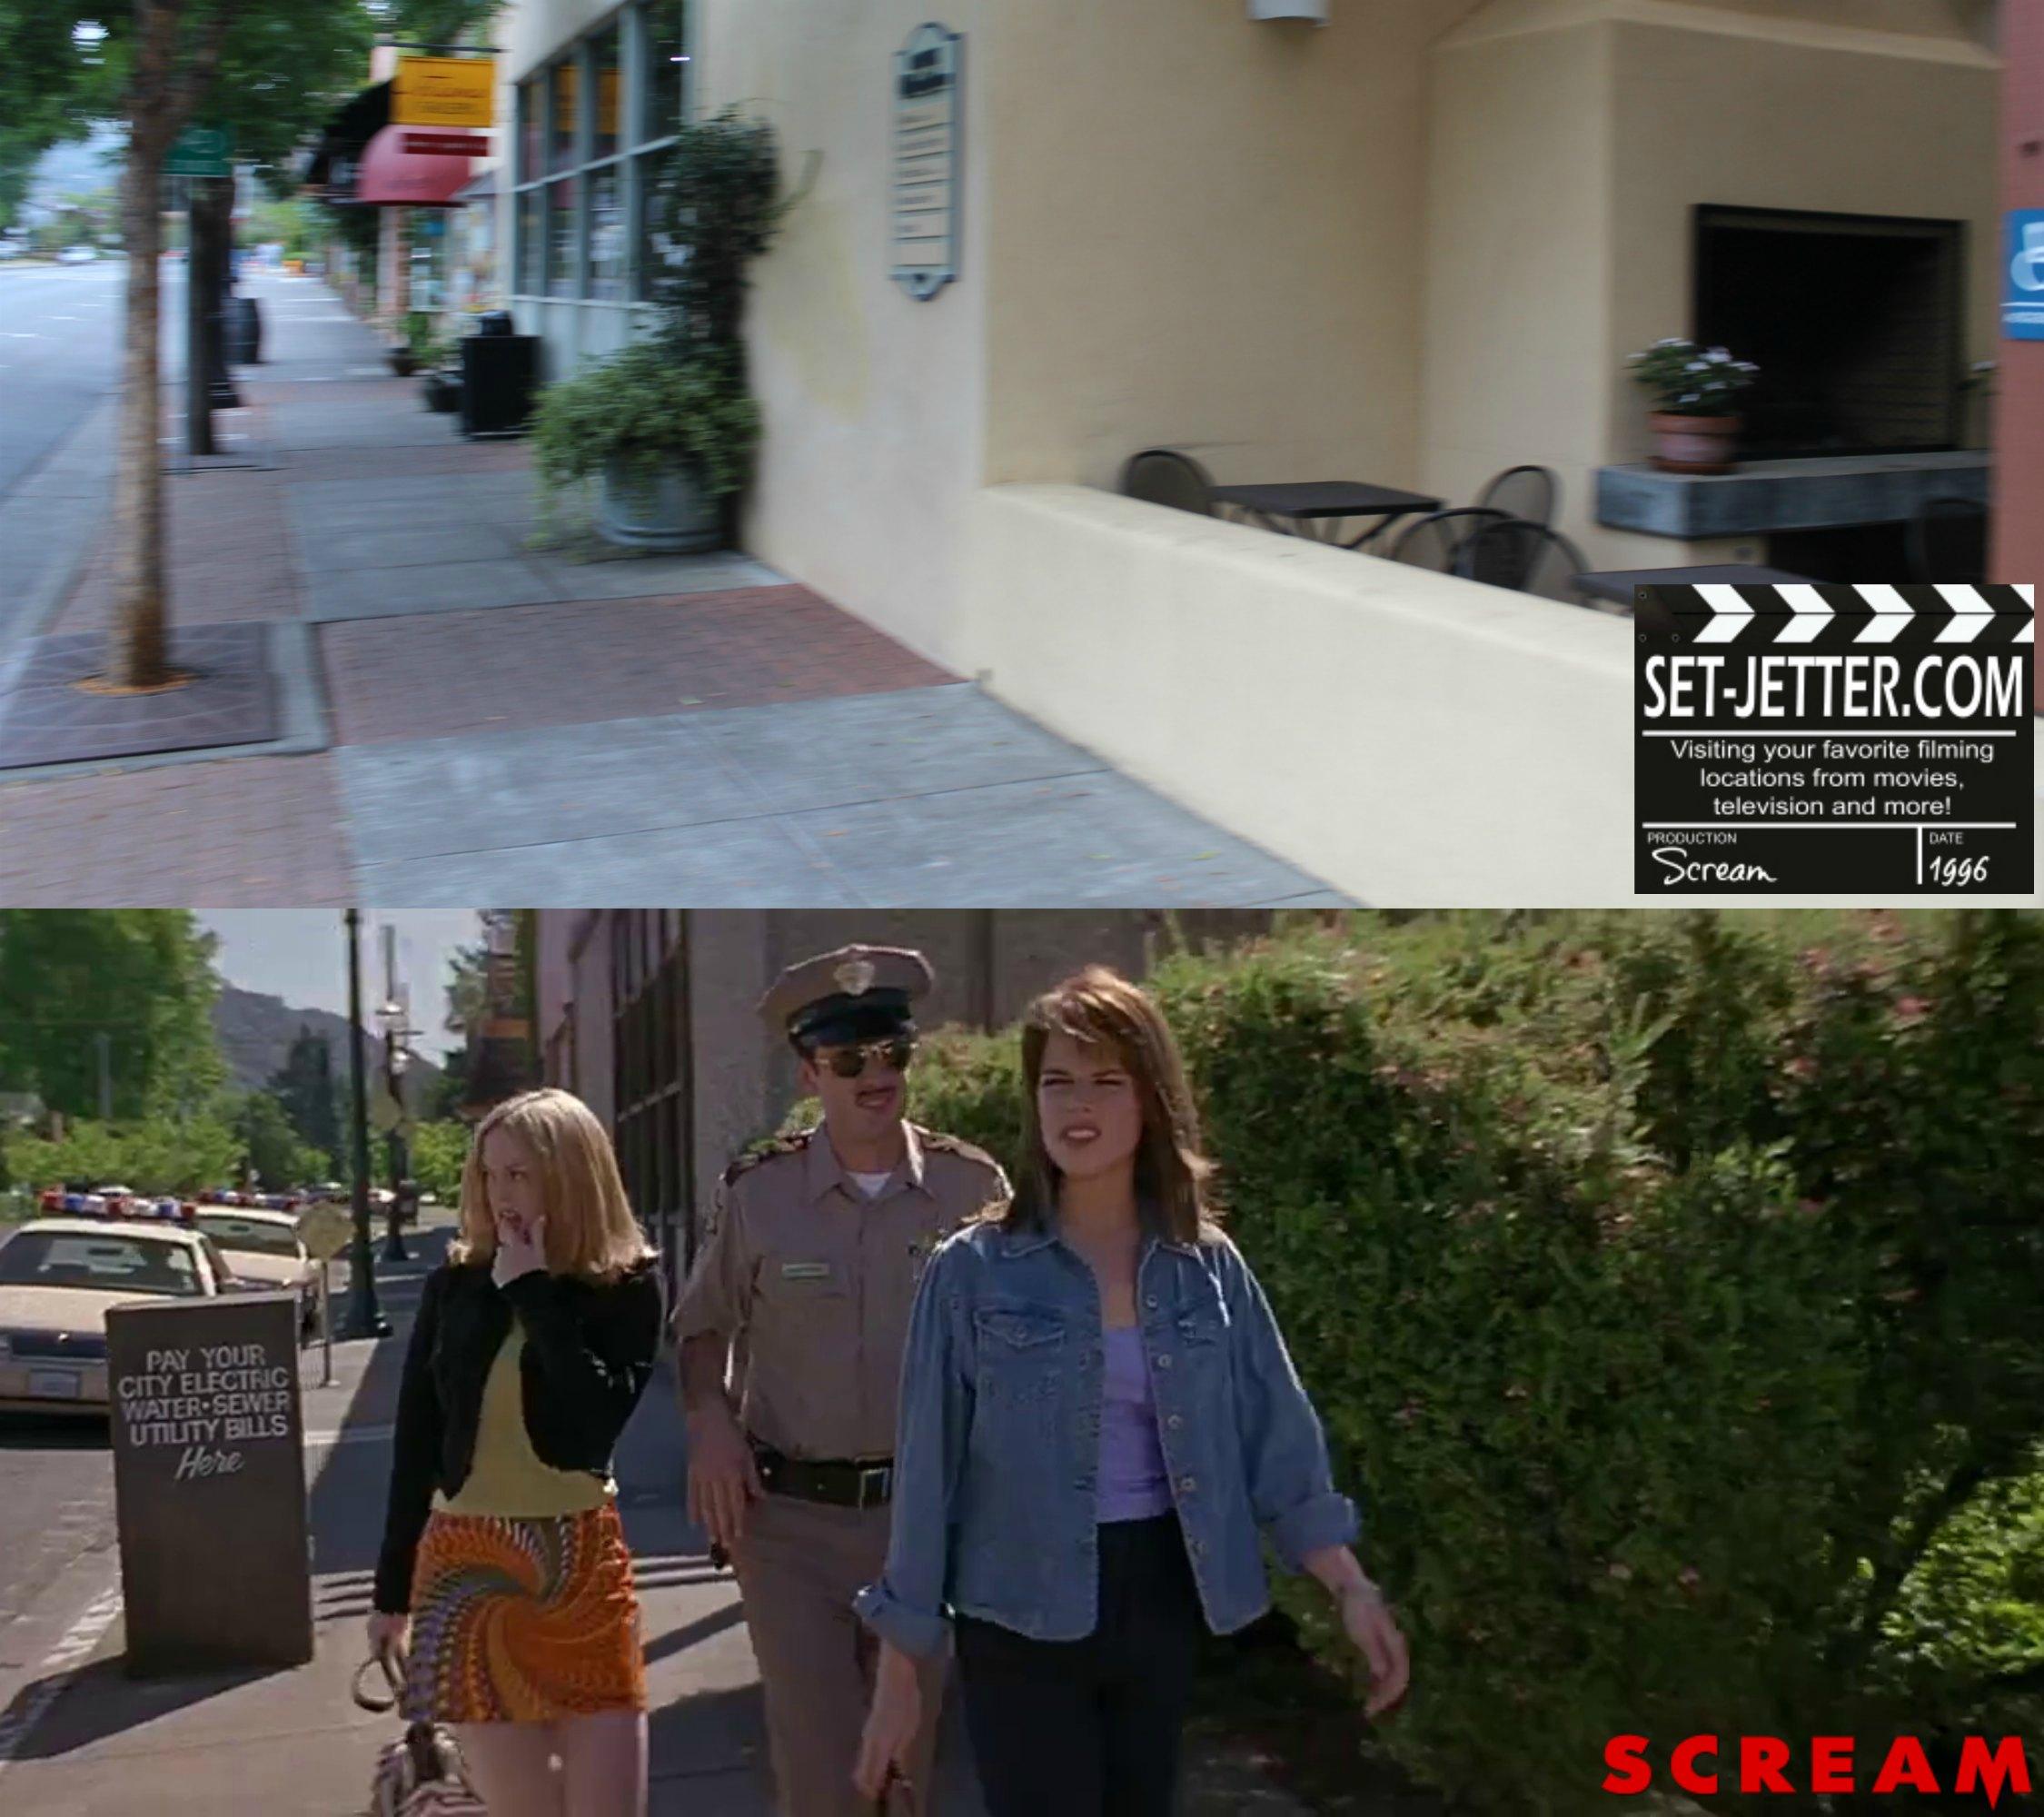 Scream comparison 216.jpg